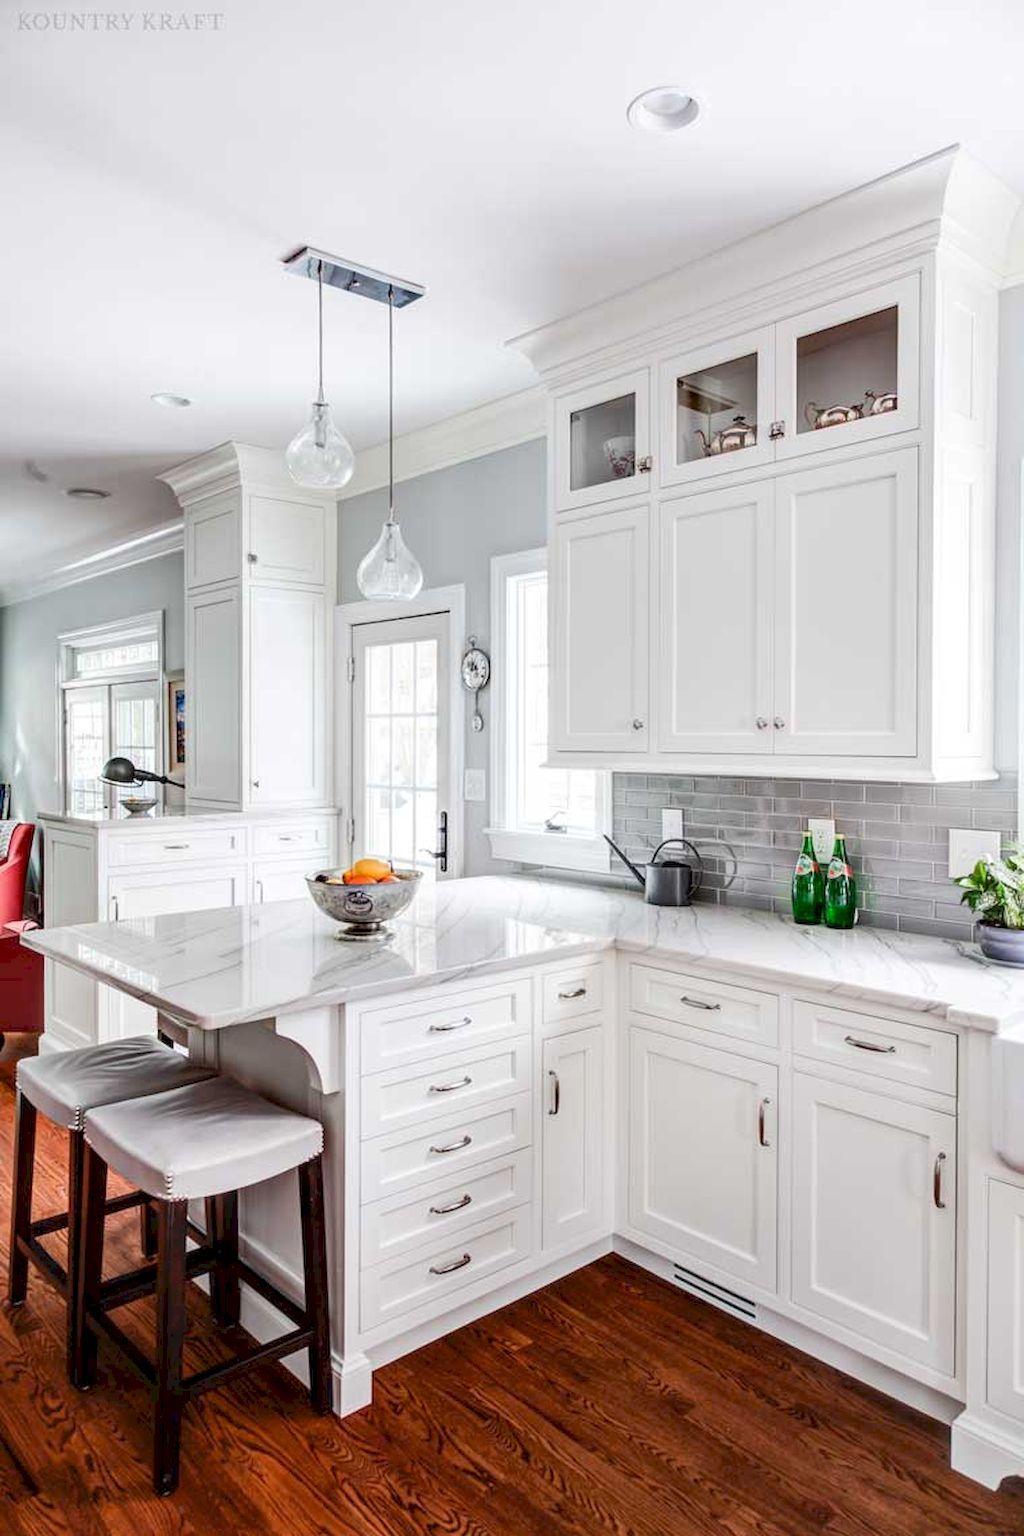 9 Beautiful White Kitchen Cabinet Makeover Ideas   crowdecor.com ...